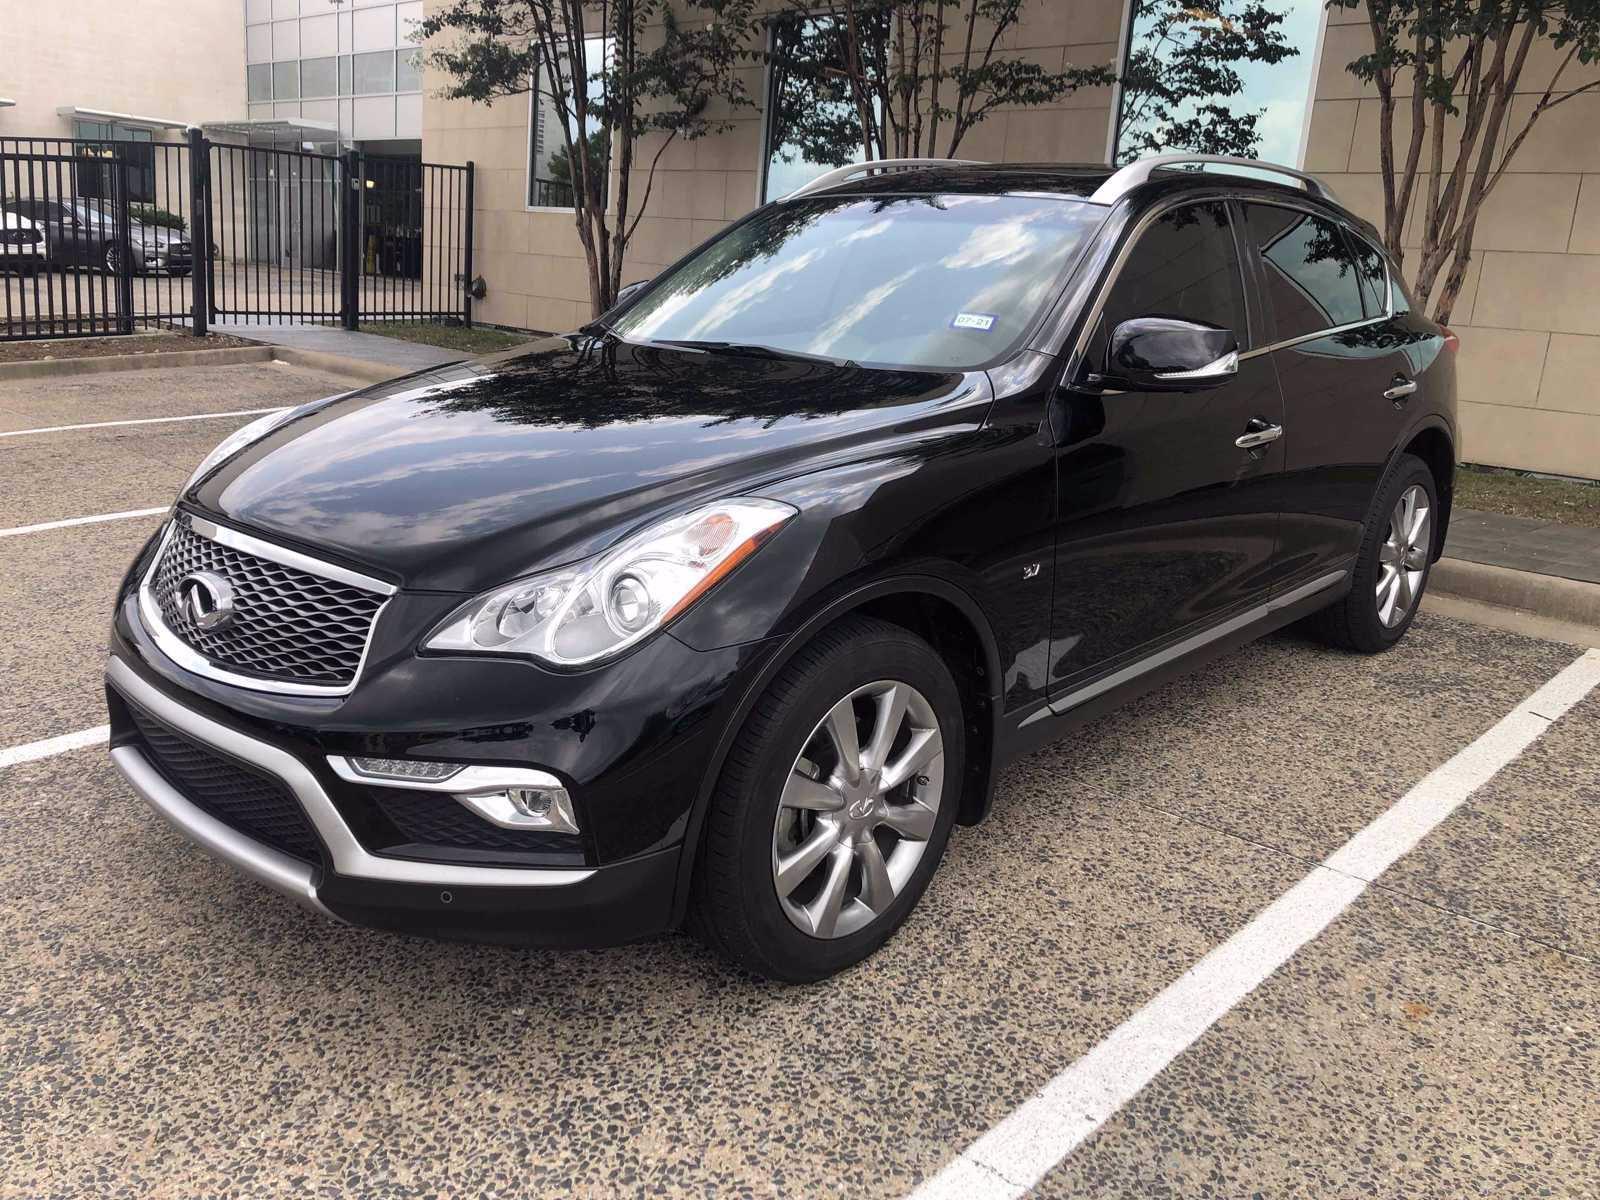 2017 INFINITI QX50 Vehicle Photo in Fort Worth, TX 76132